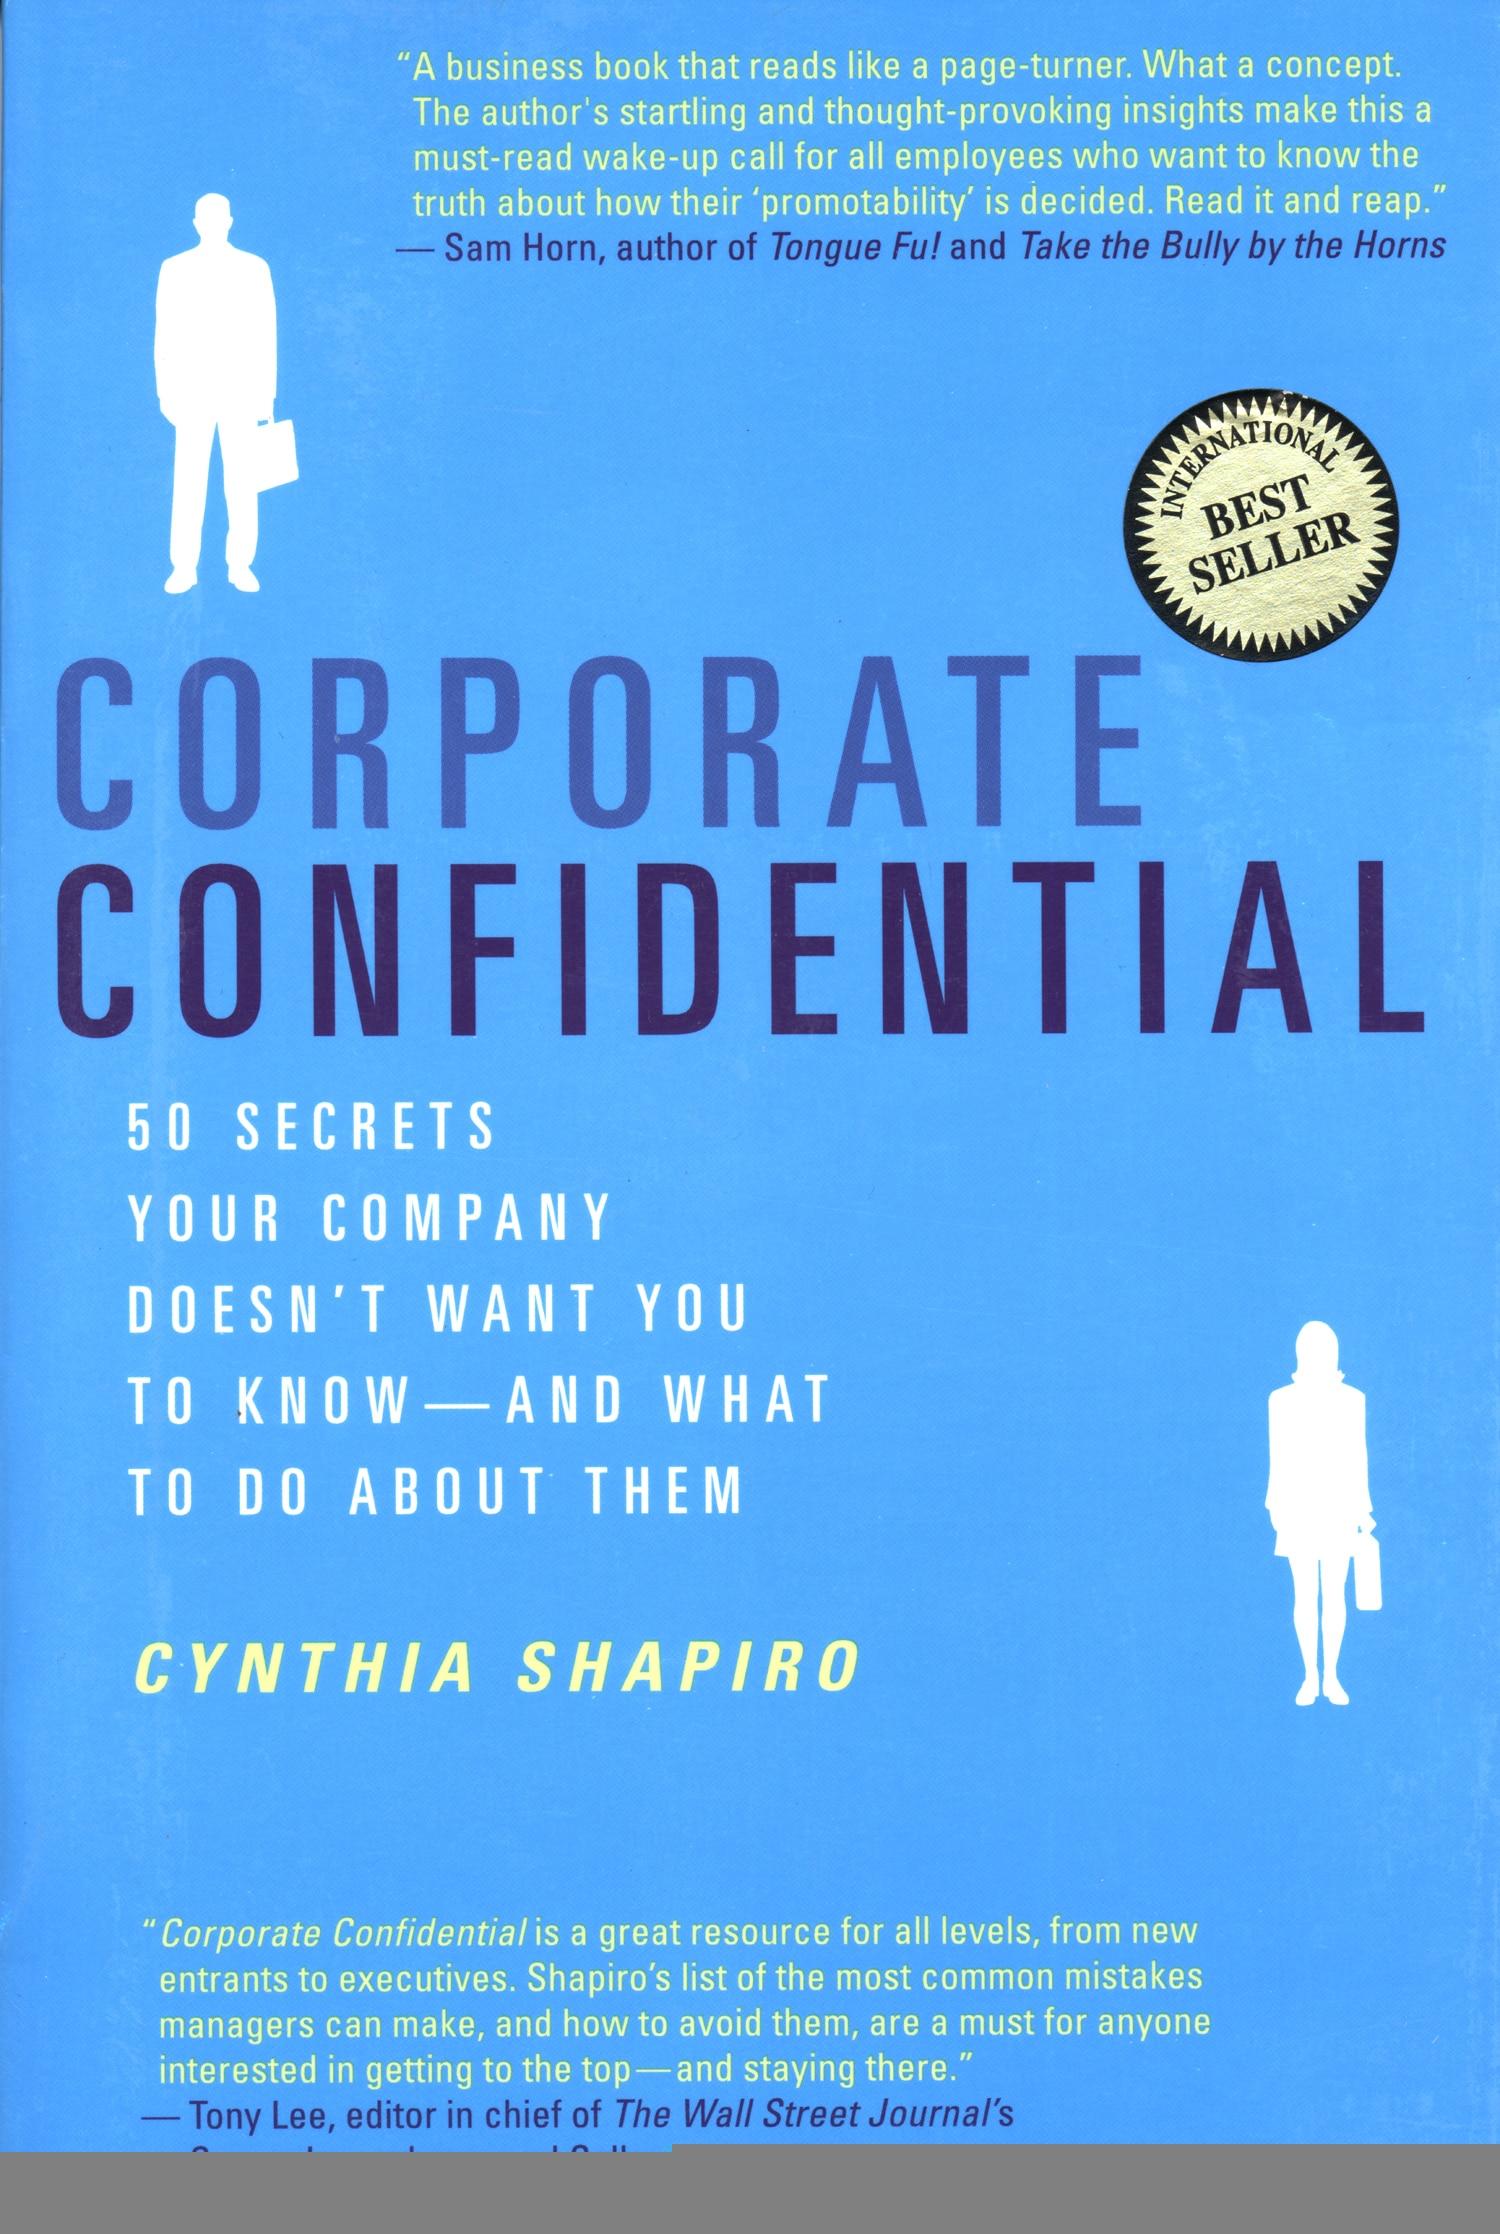 Corporate Confidential by Cynthia Shapiro